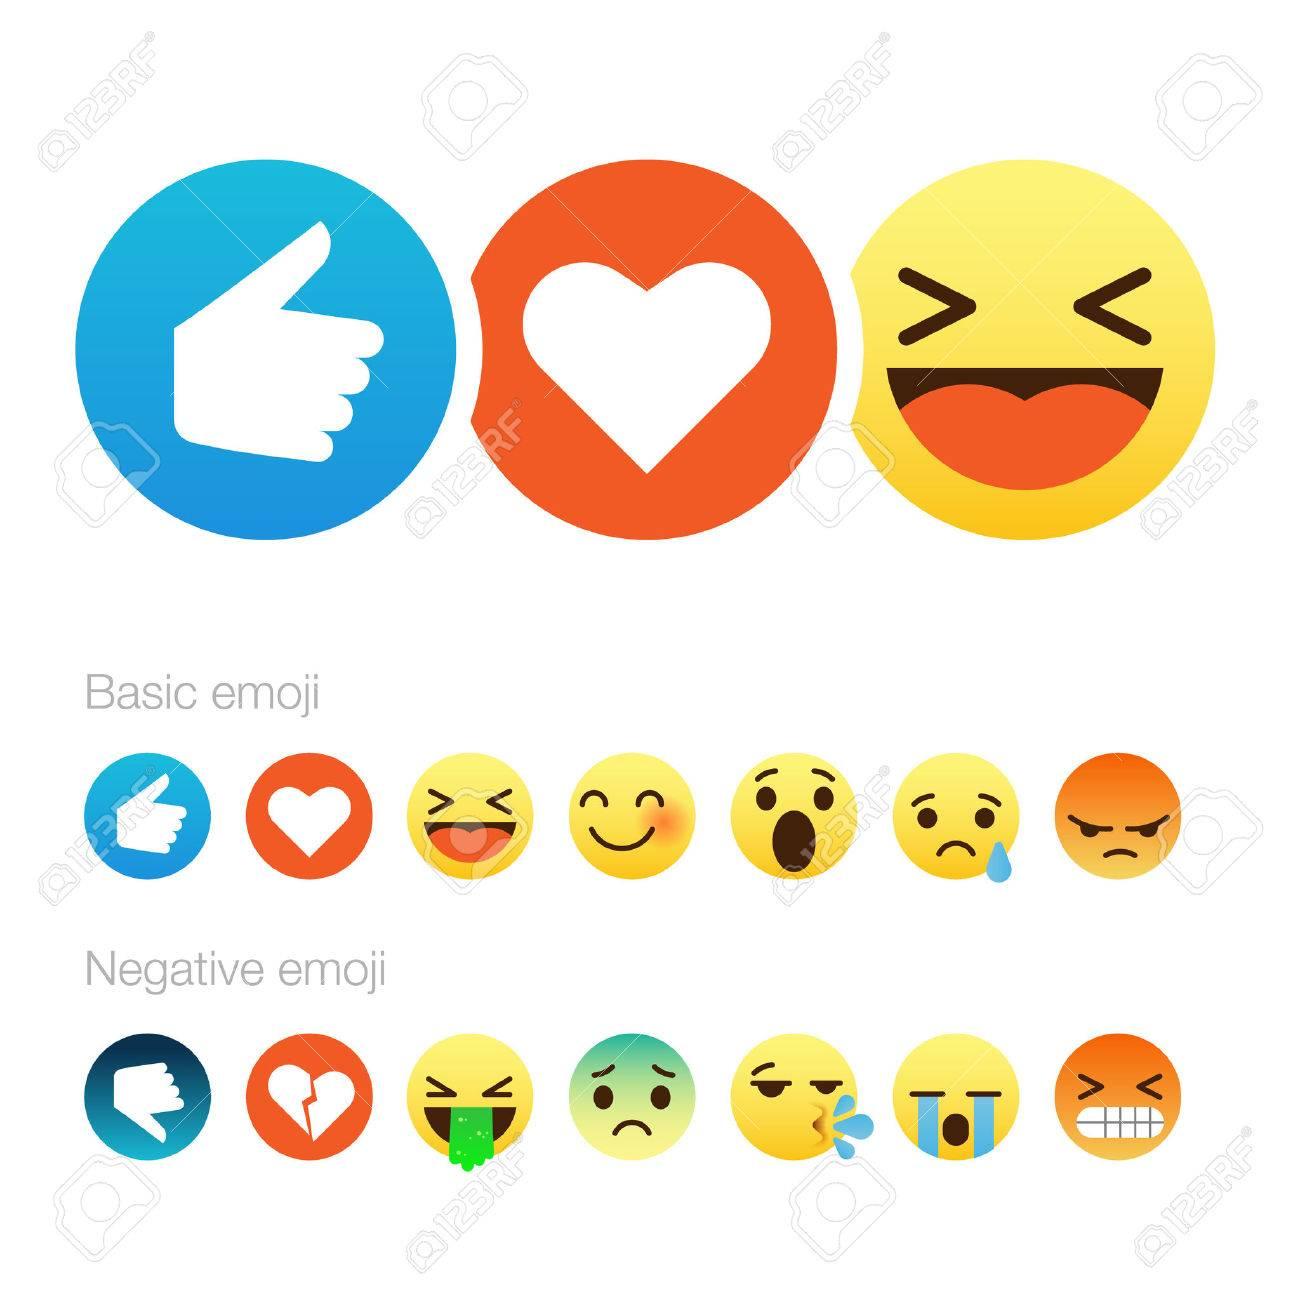 Set of cute smiley emoticons, emoji flat design, vector illustration. Standard-Bild - 53022852